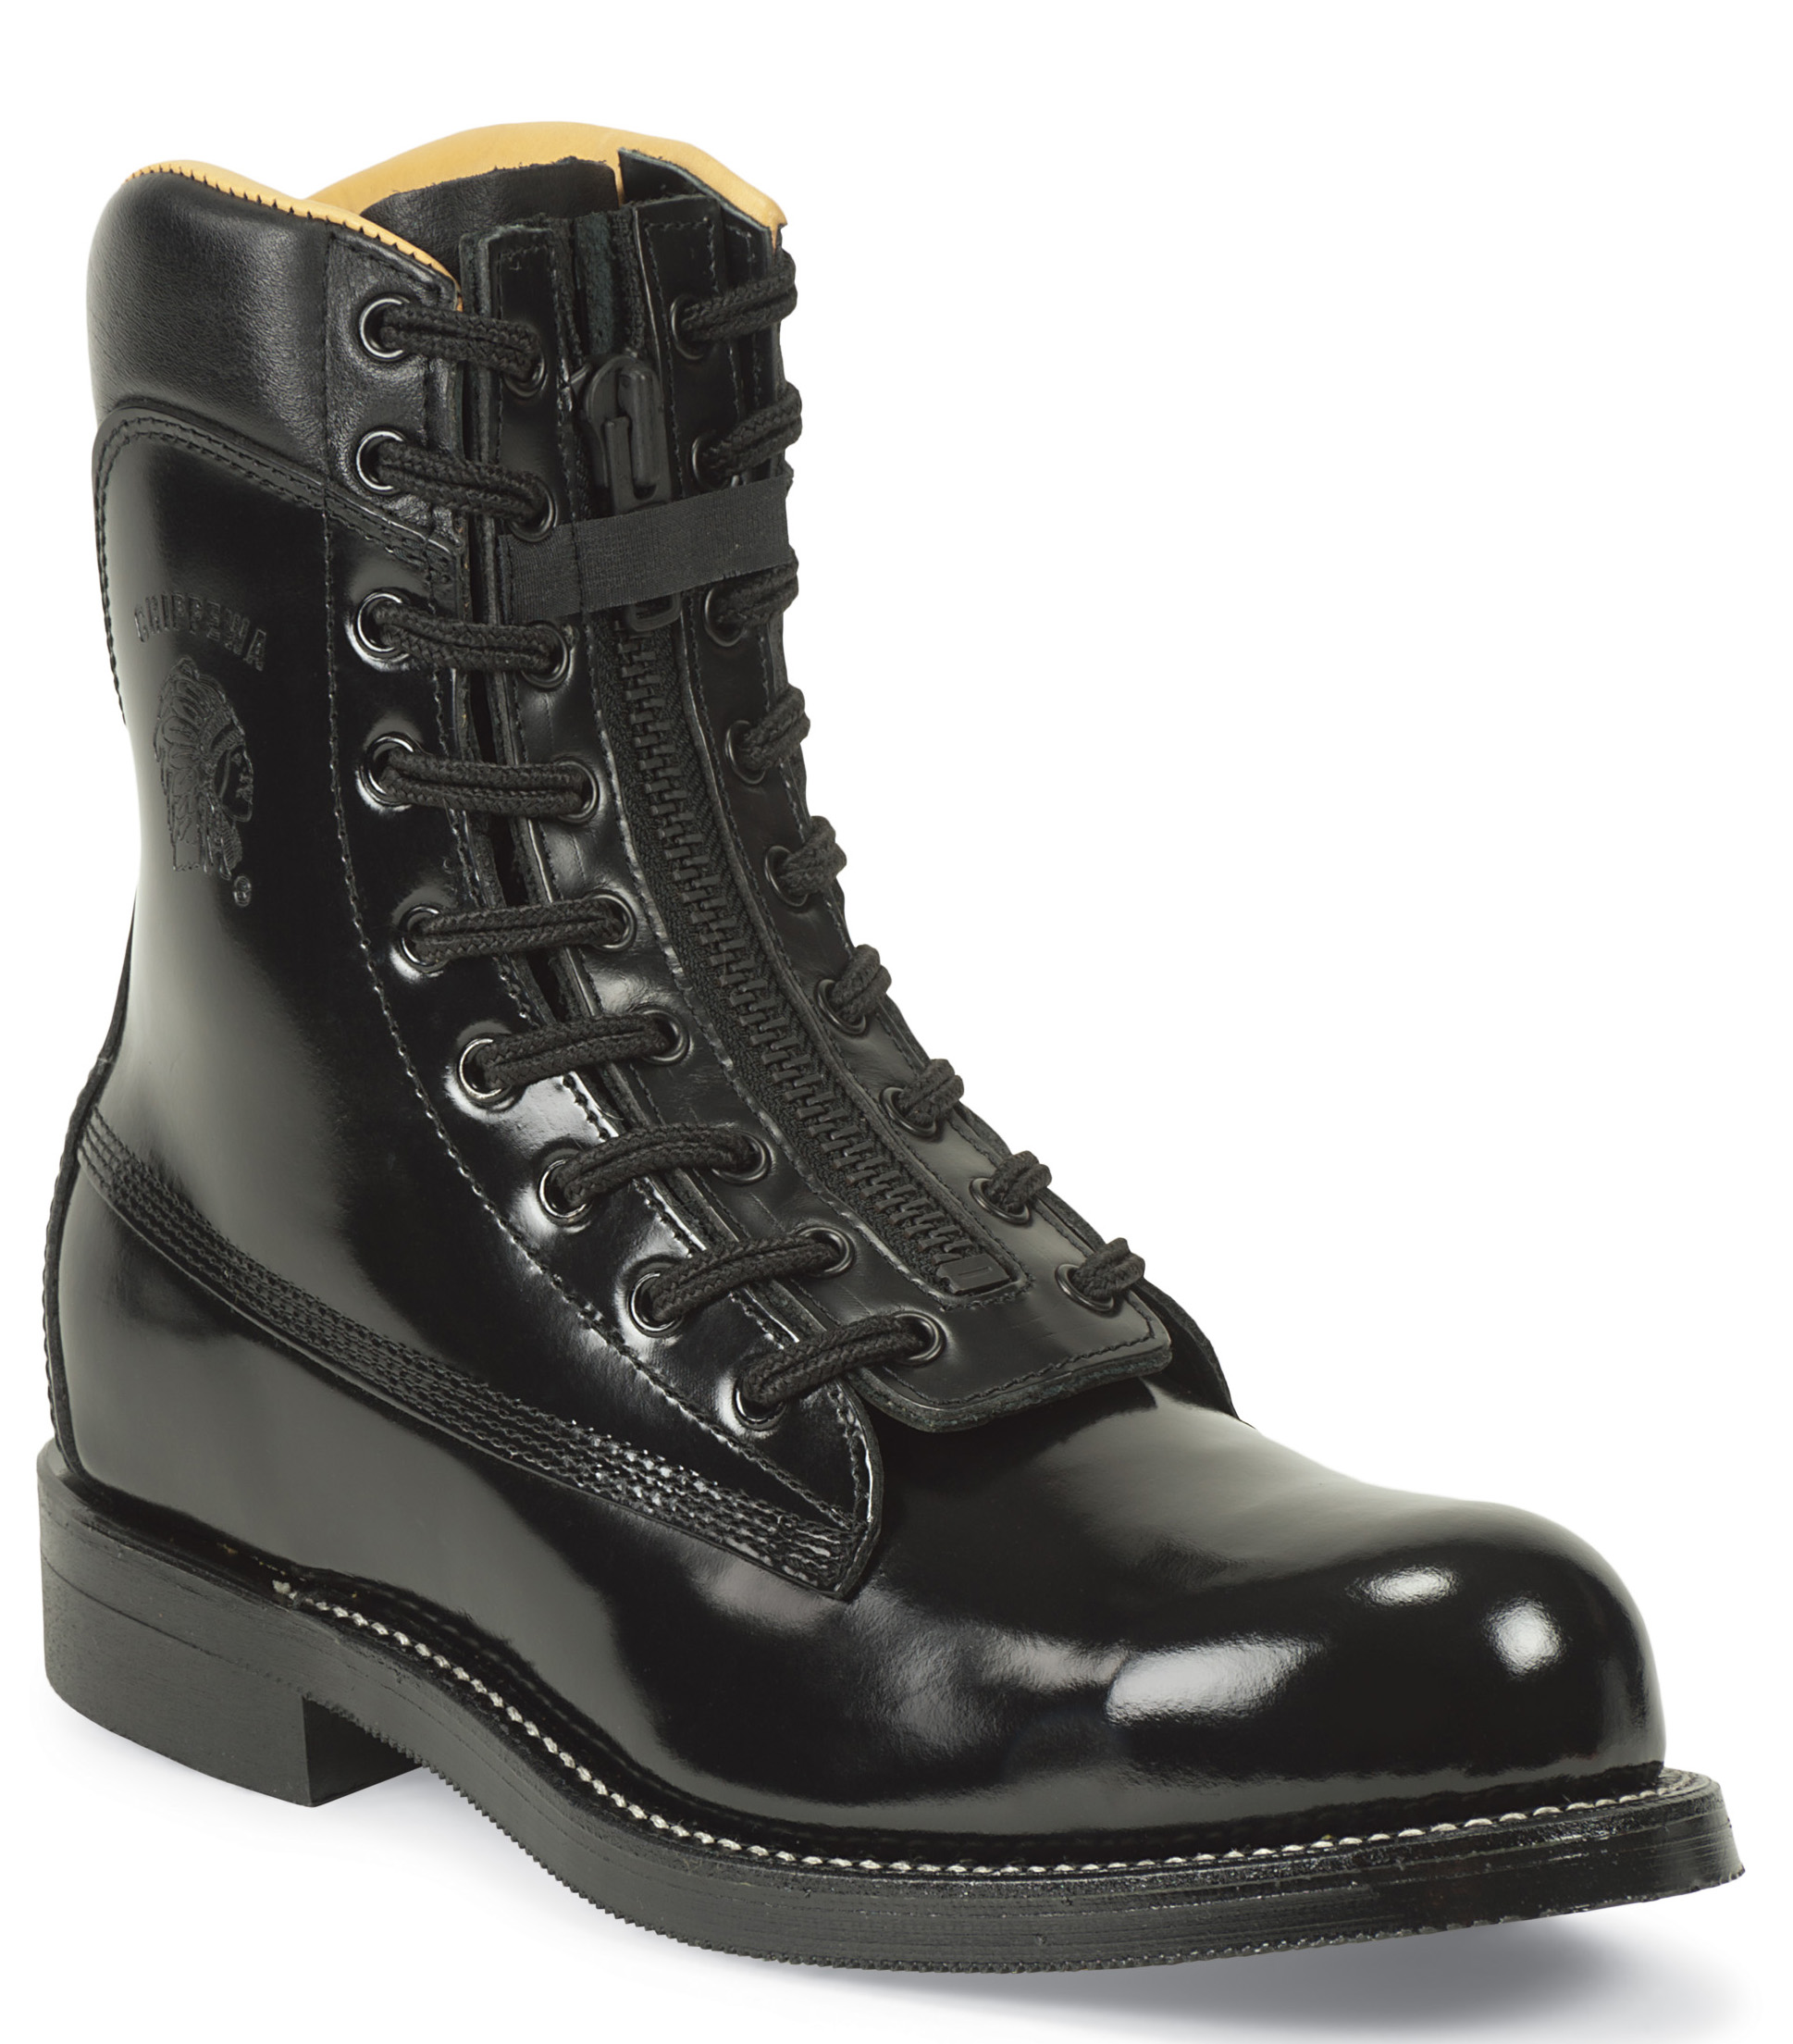 Chippewa Men's Chippewa Steel Toe Melo-Veal Work Boot Made In USA Black 20242 Medium at Sears.com